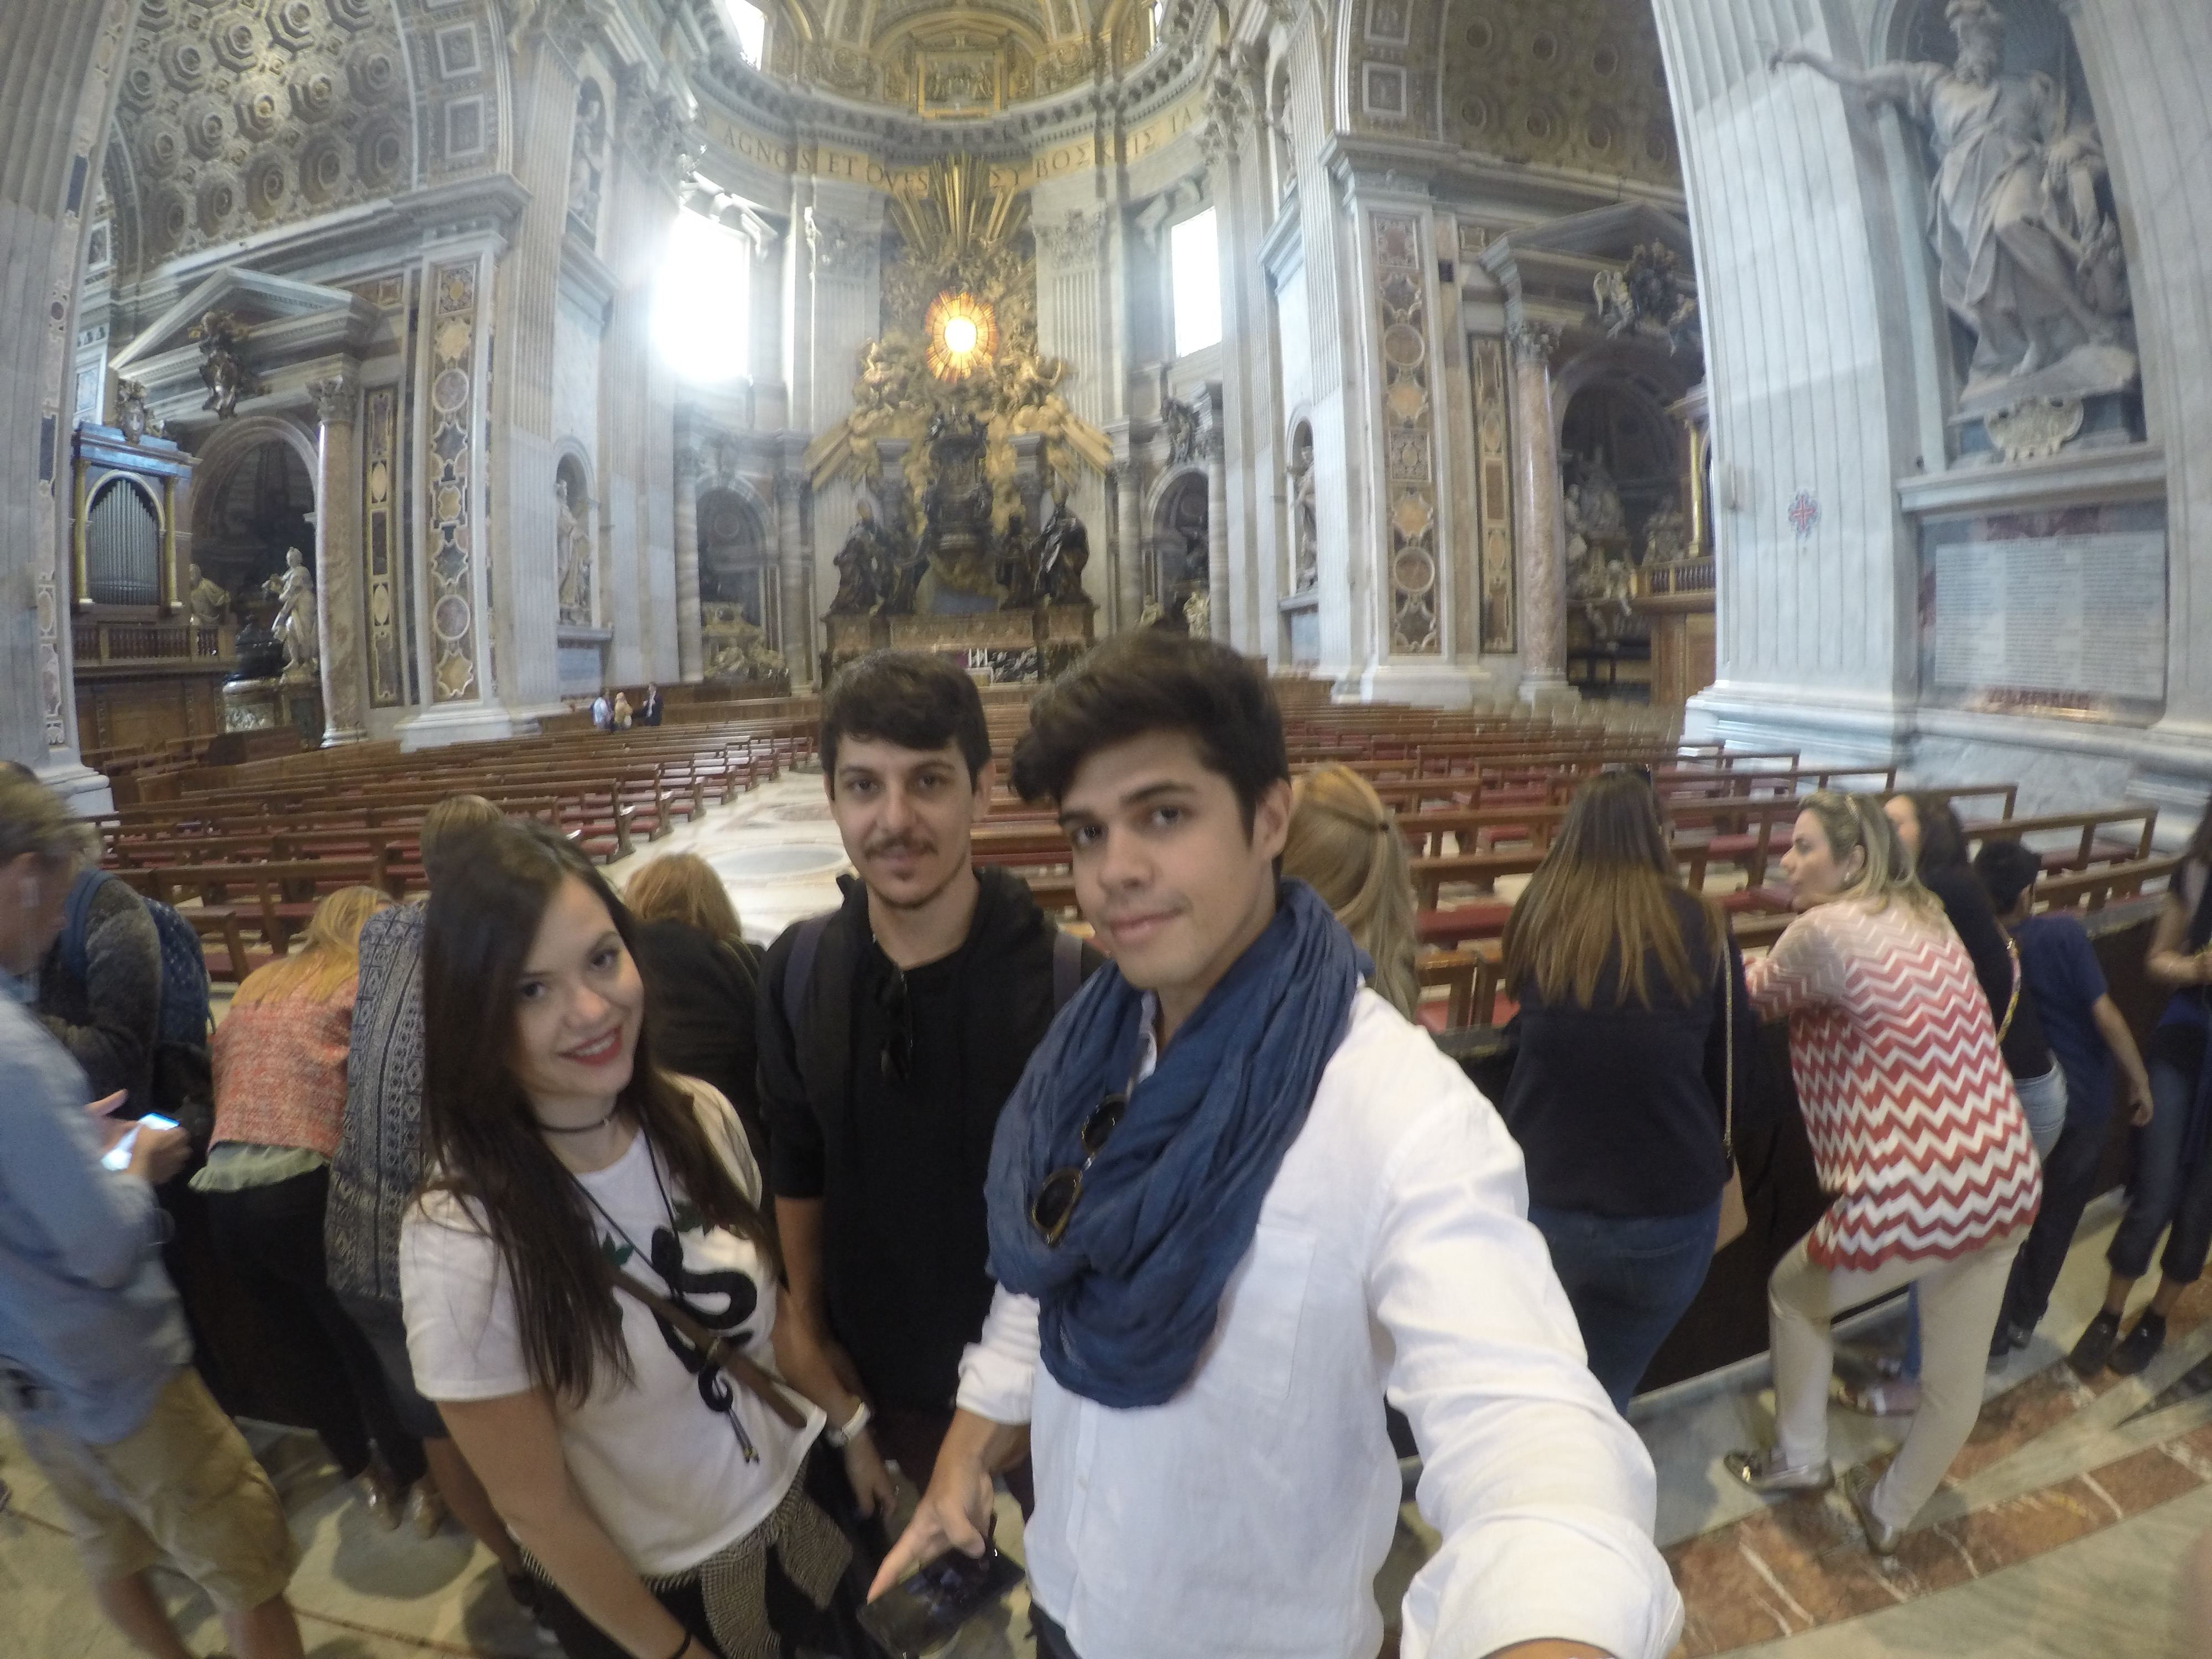 basilica-de-sao-pedro-roma-italia